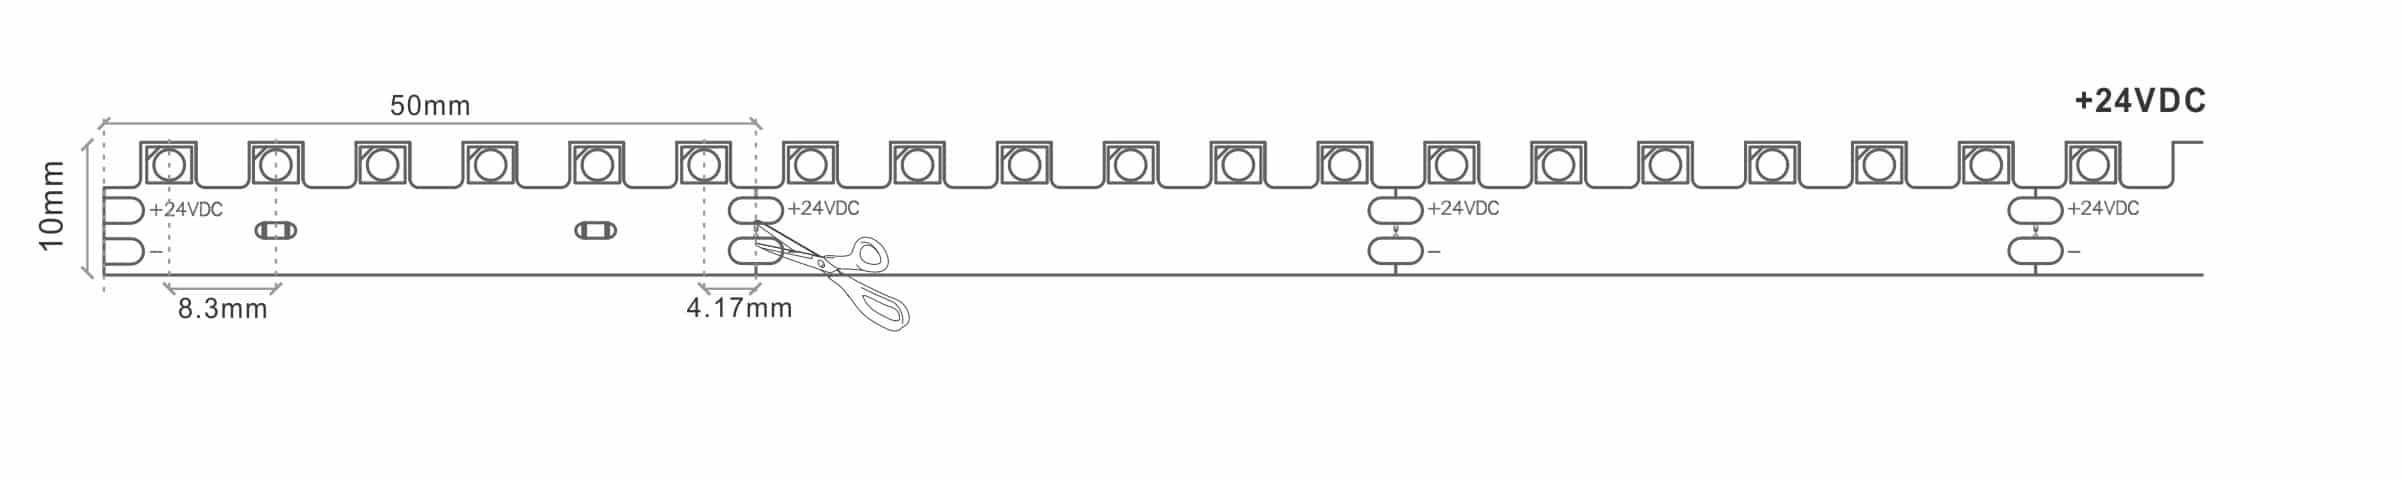 3D Bendable LED Tape Strip Light